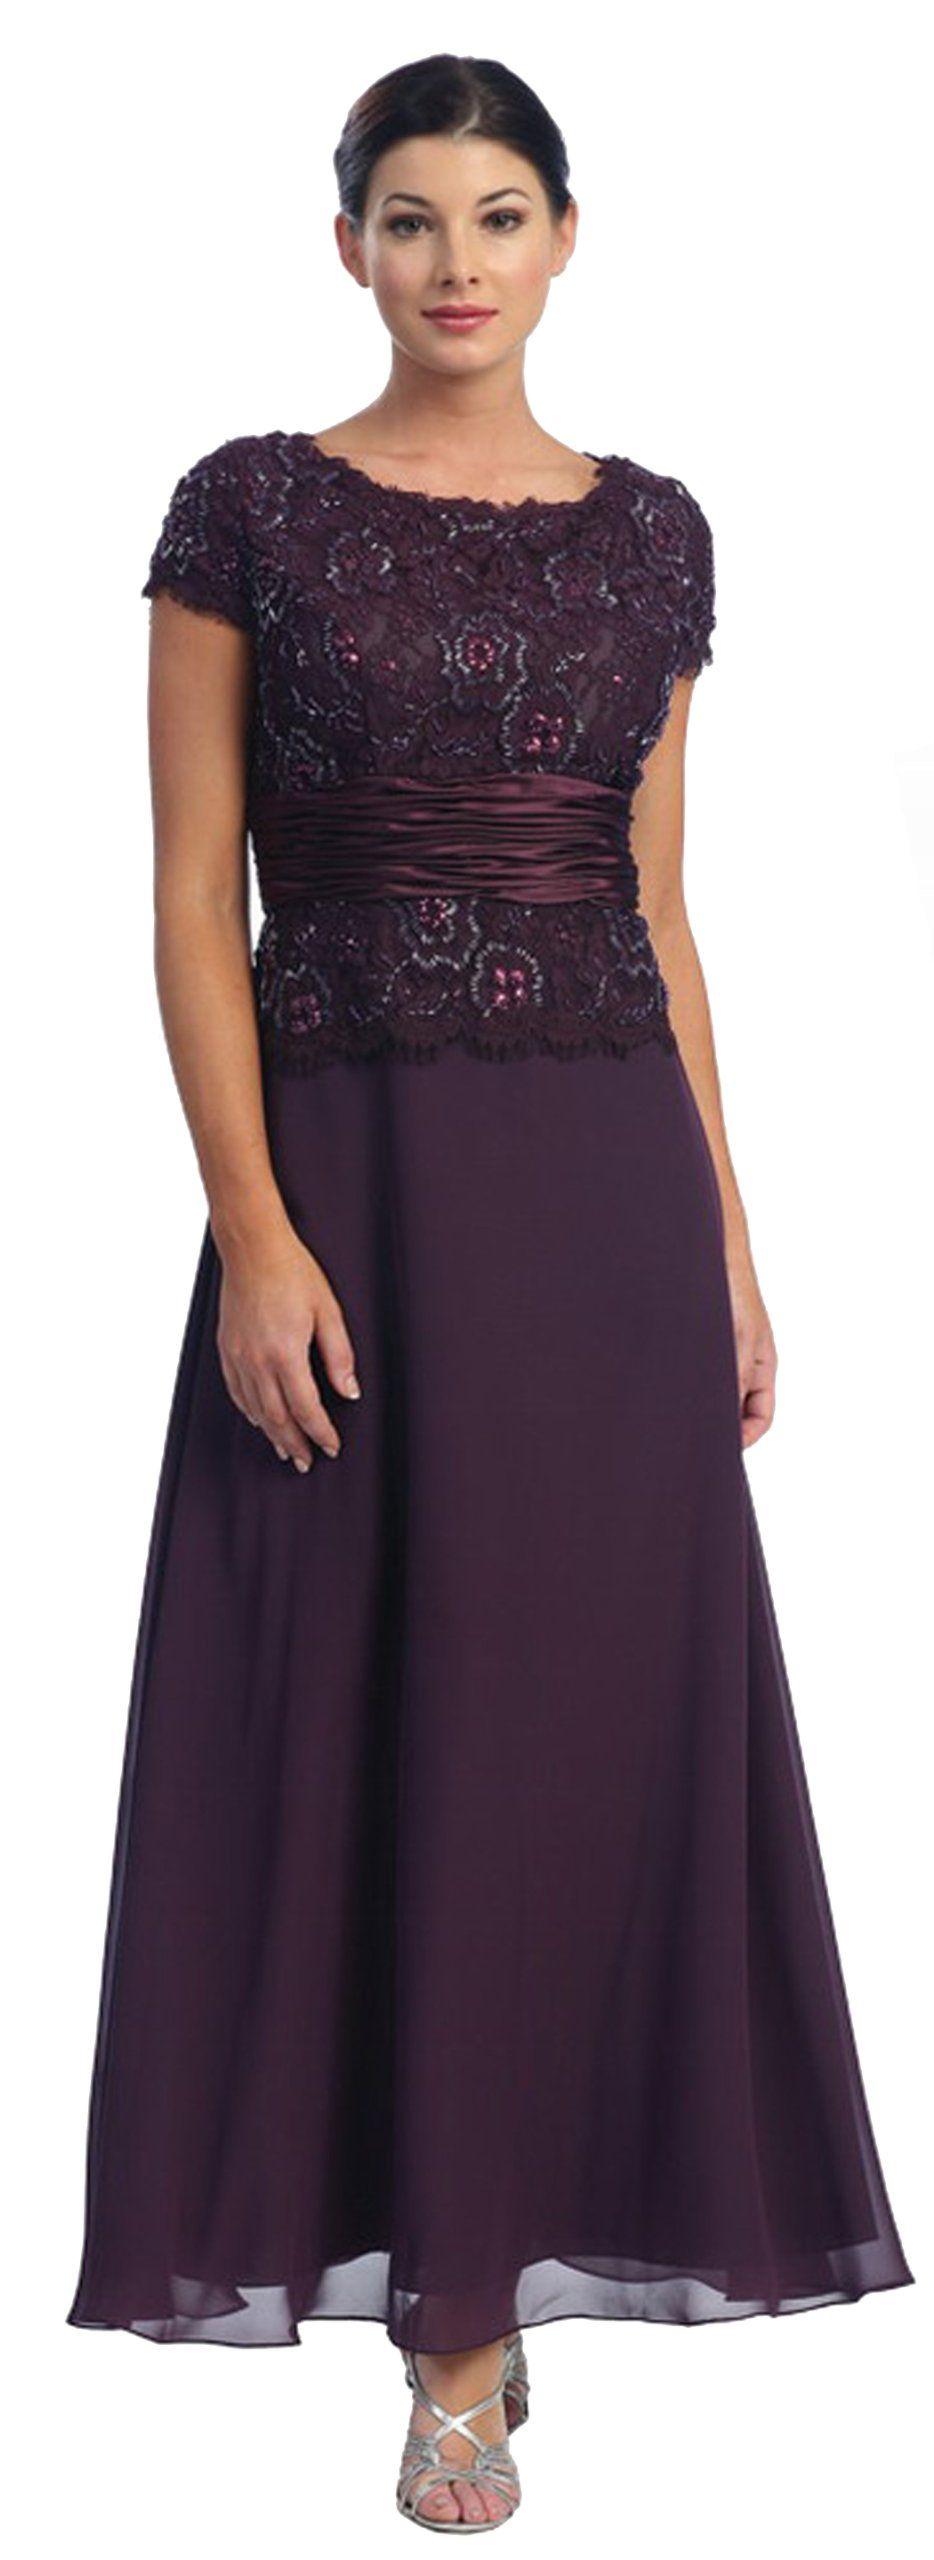 Mother of the Bride Formal Evening Dress 571 (Large